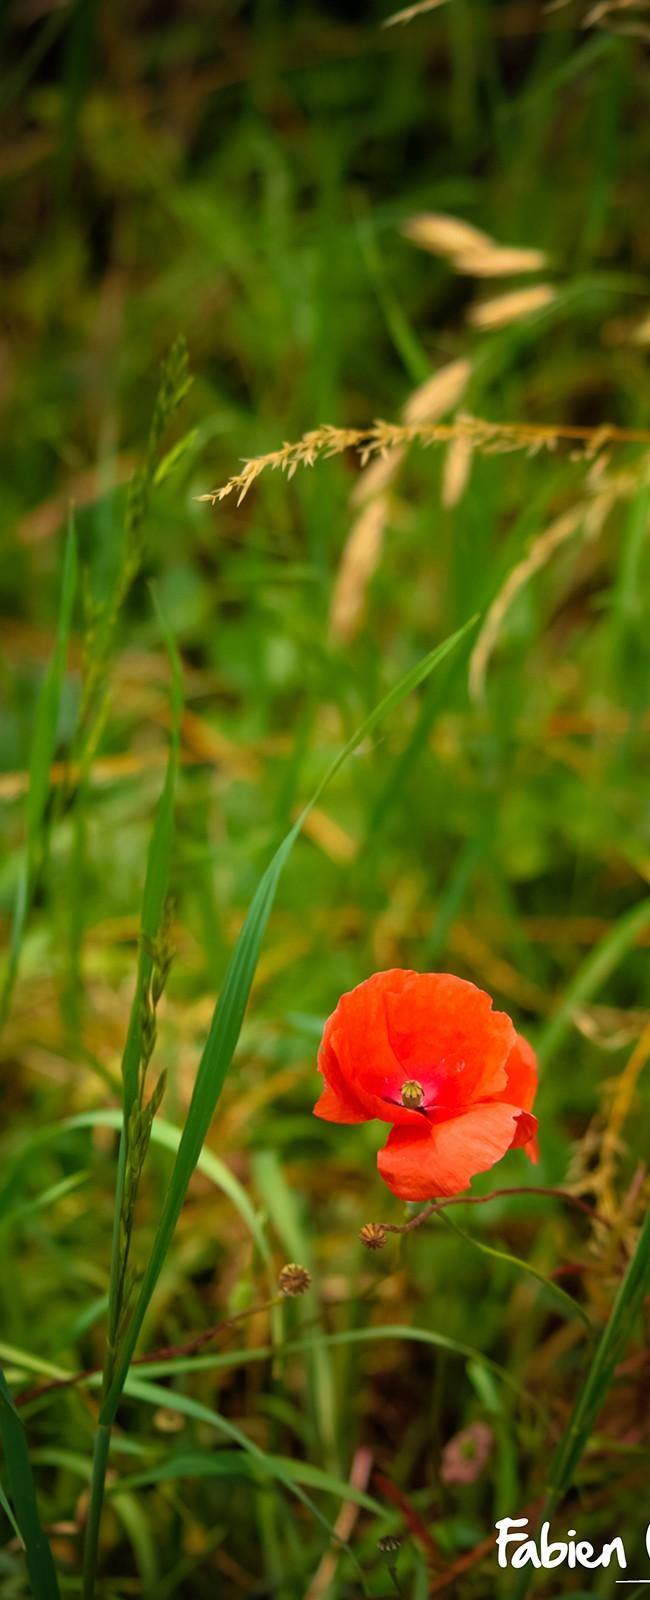 Alone In The Field